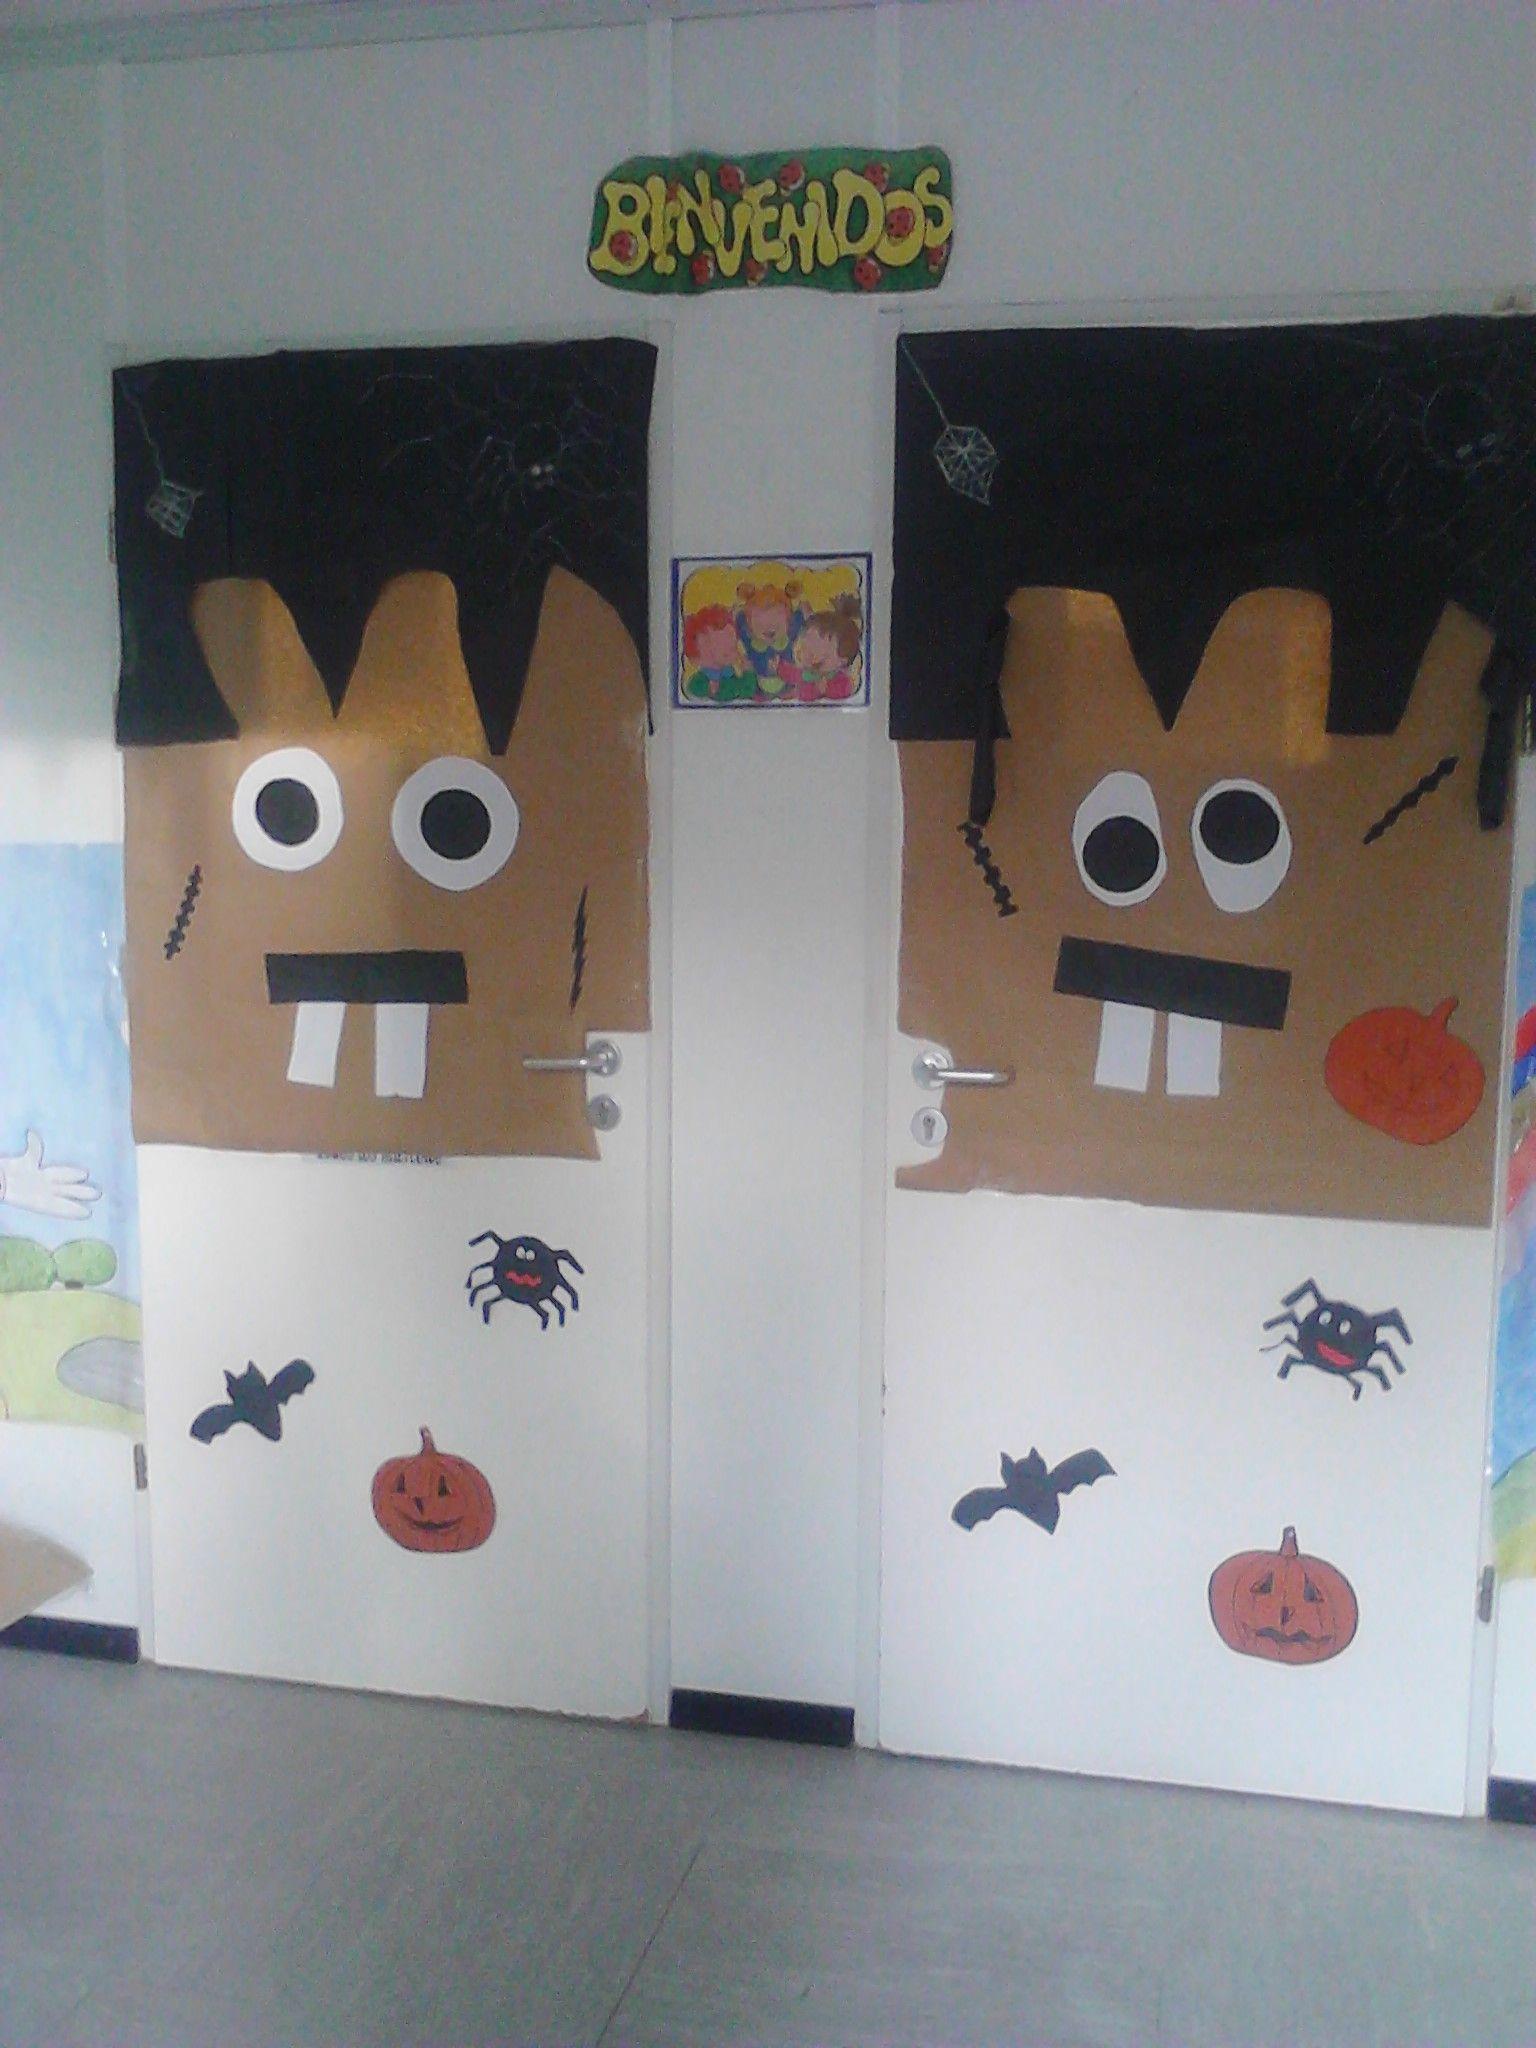 Imagenes puertas decoradas halloween buscar con google for Puertas decoradas con dinosaurios